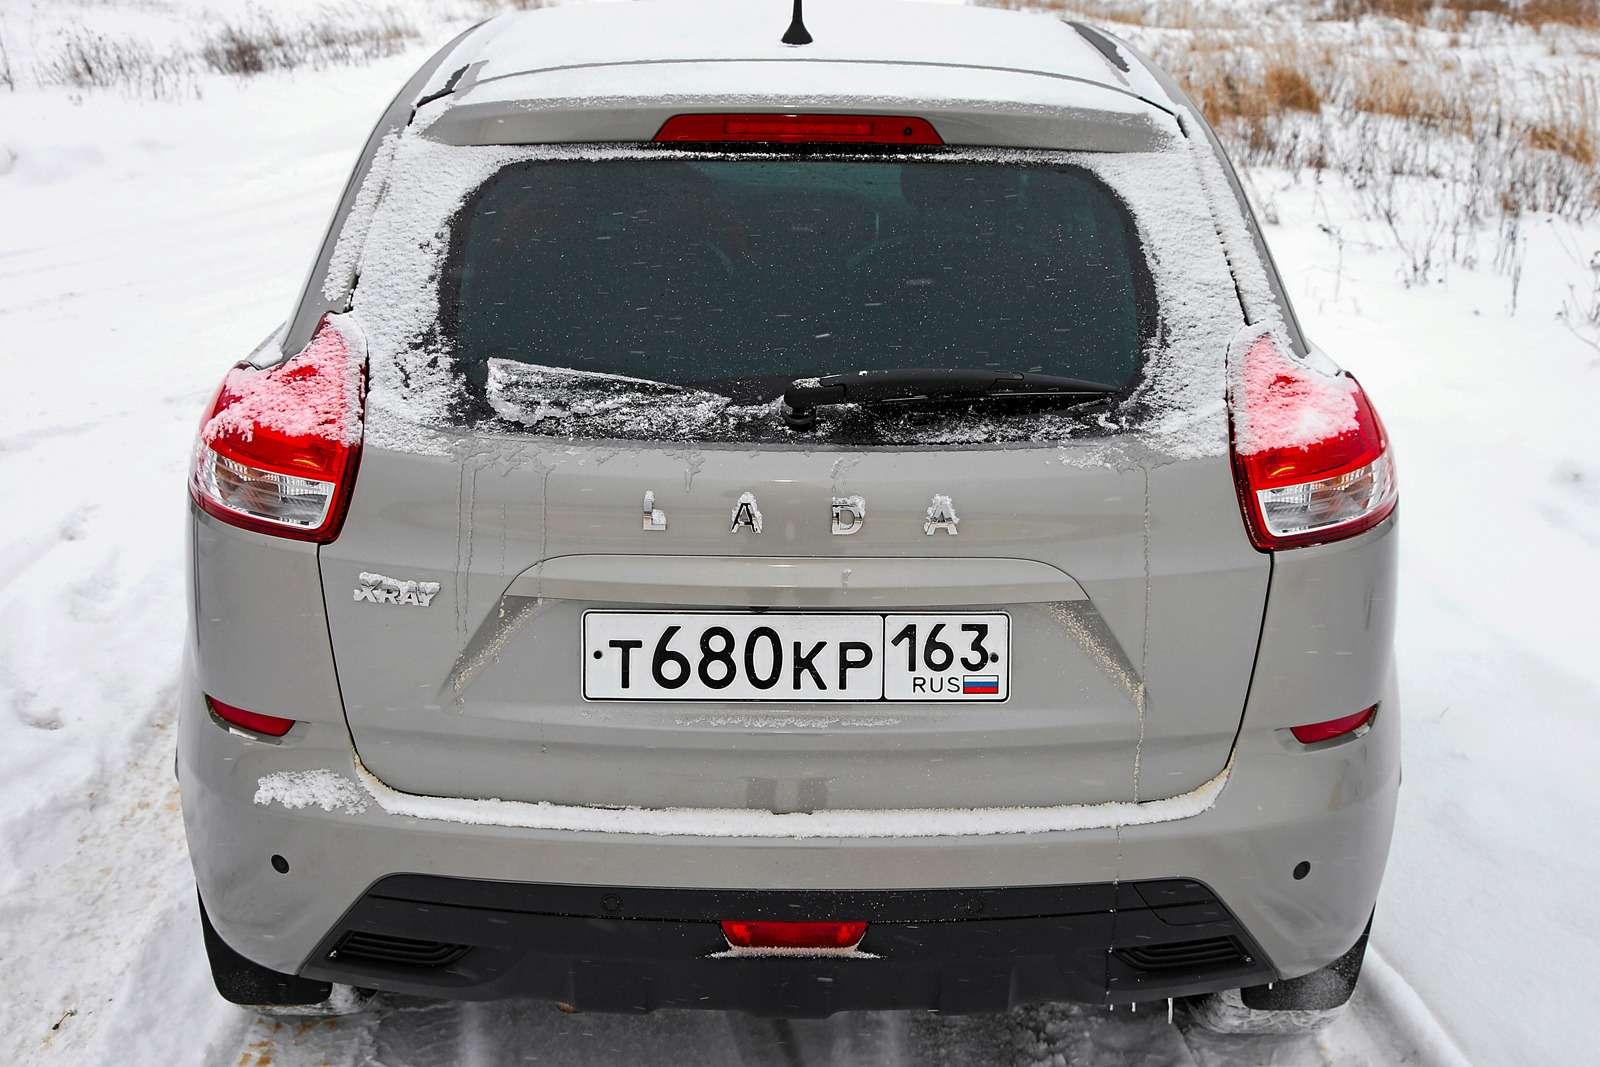 Большой зимний тест: Lada Vesta, Lada XRAY иDatsun mi-DO изпарка ЗР— фото 571434